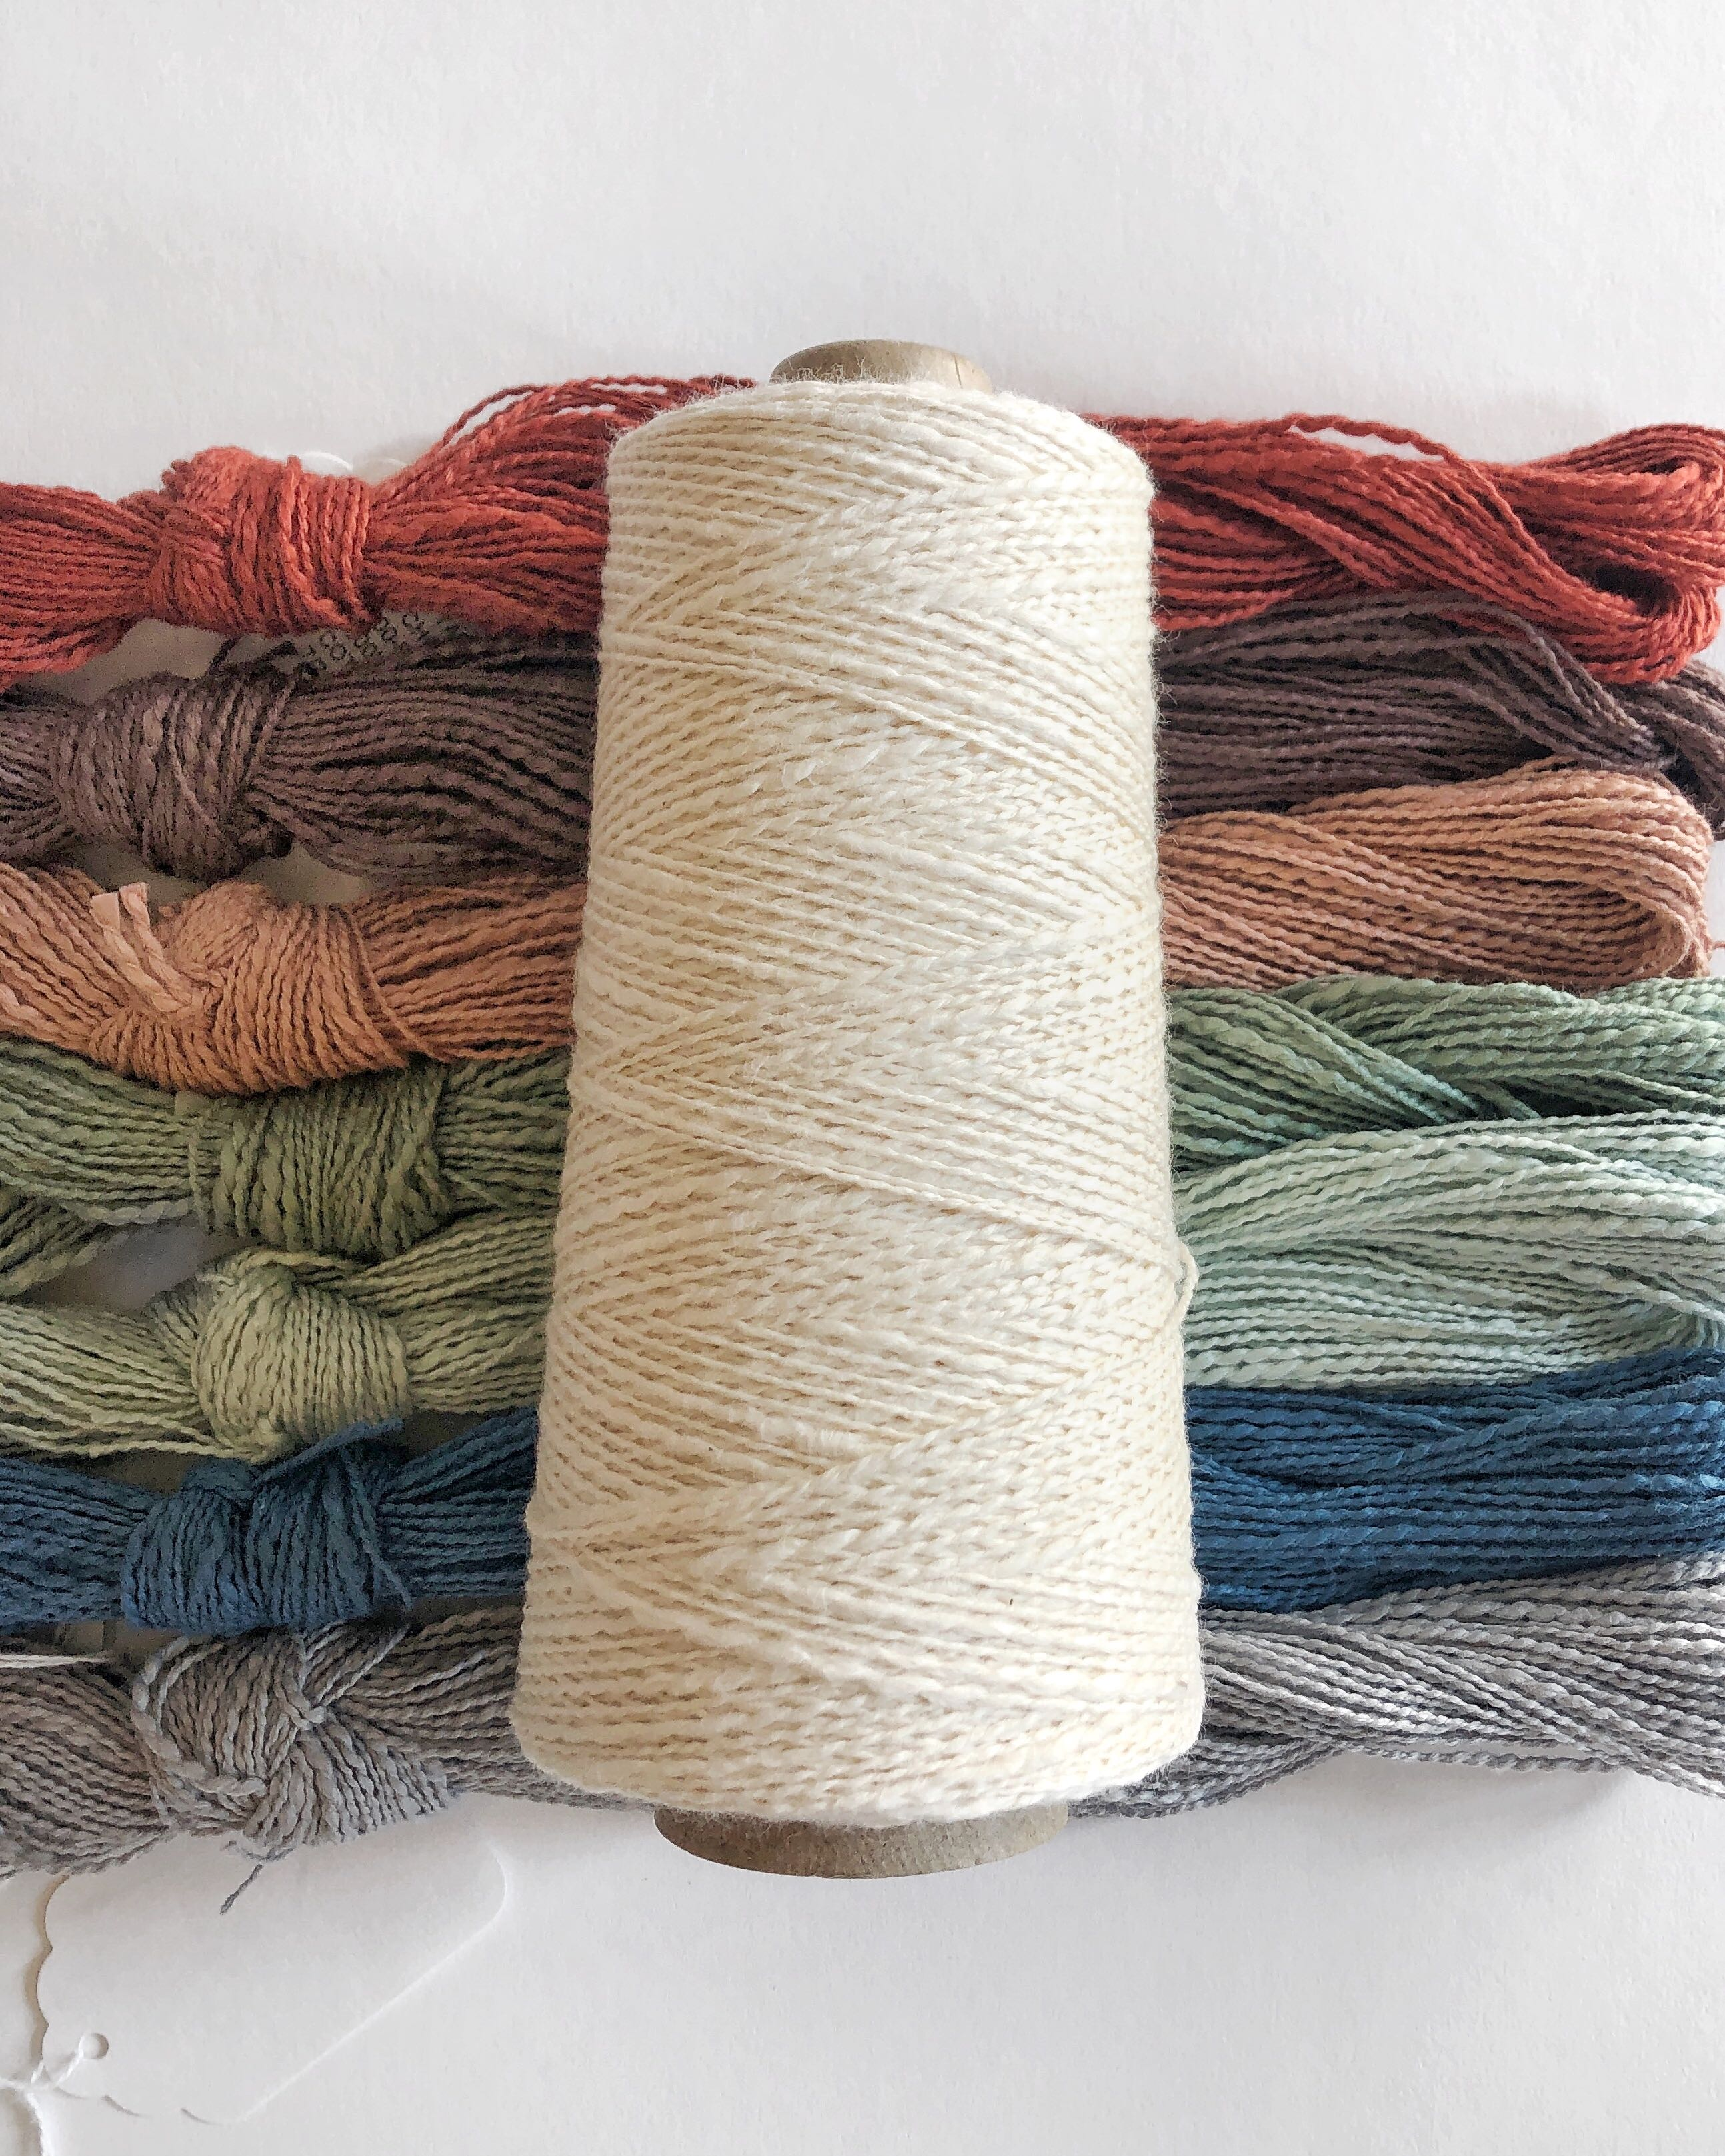 Mallo Cotton Slub Weaving Yarn – GIST: Yarn & Fiber